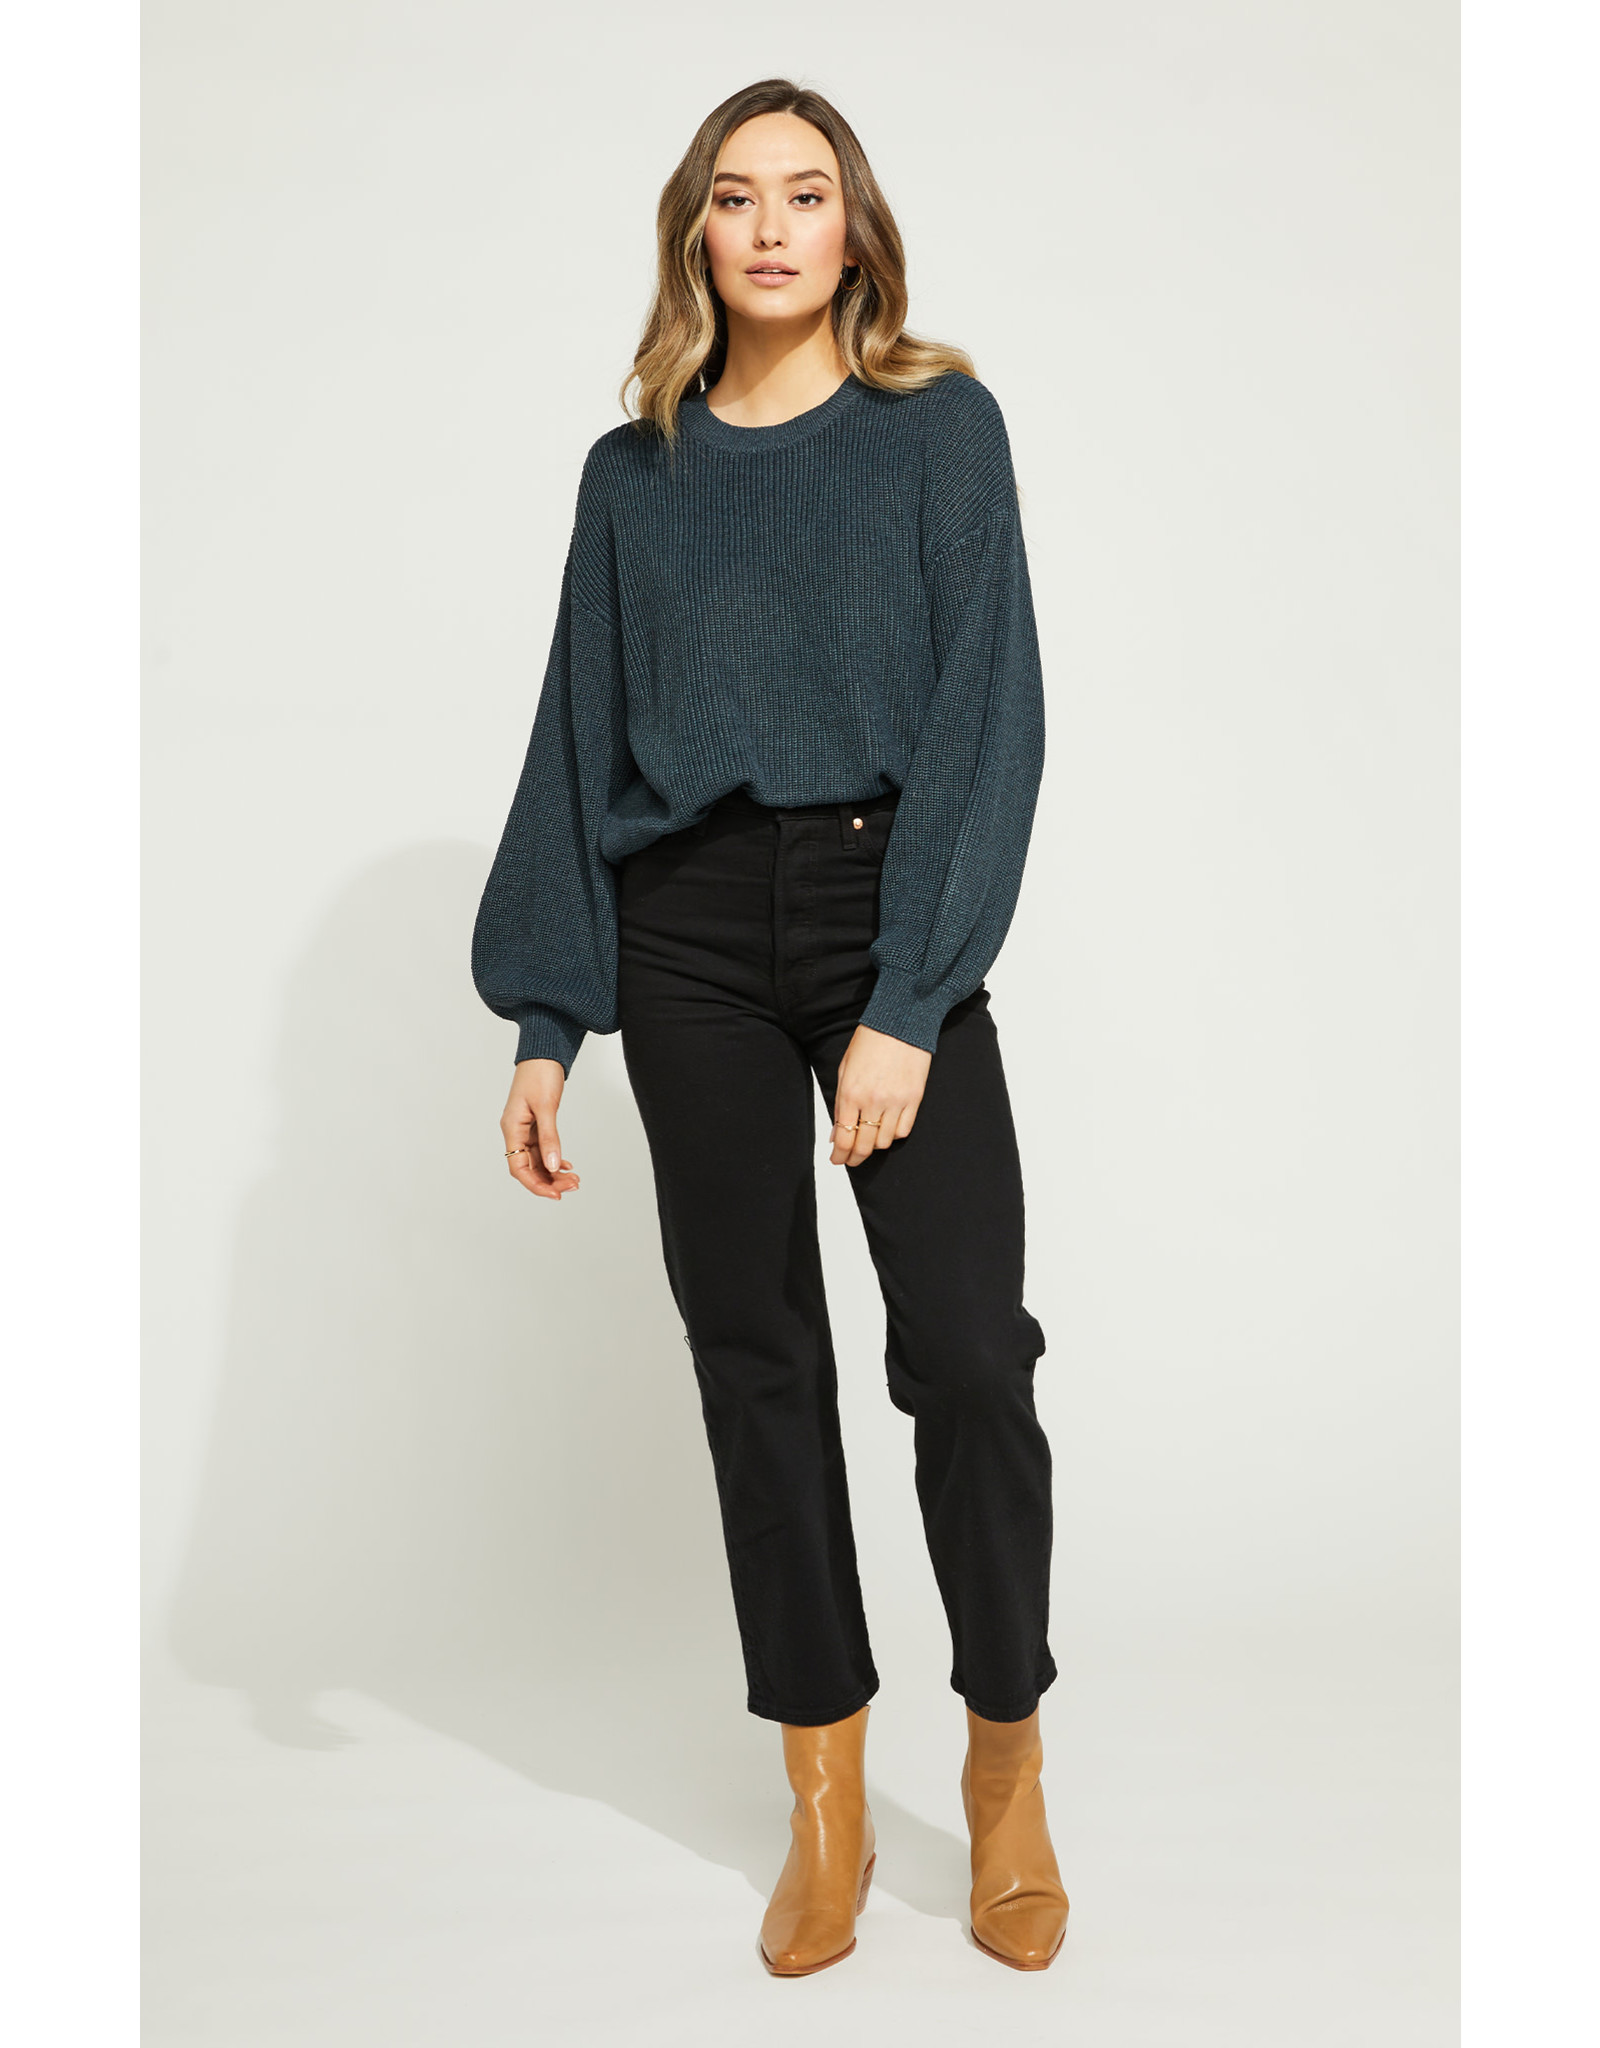 Gentle Fawn - Evergreen Sweater